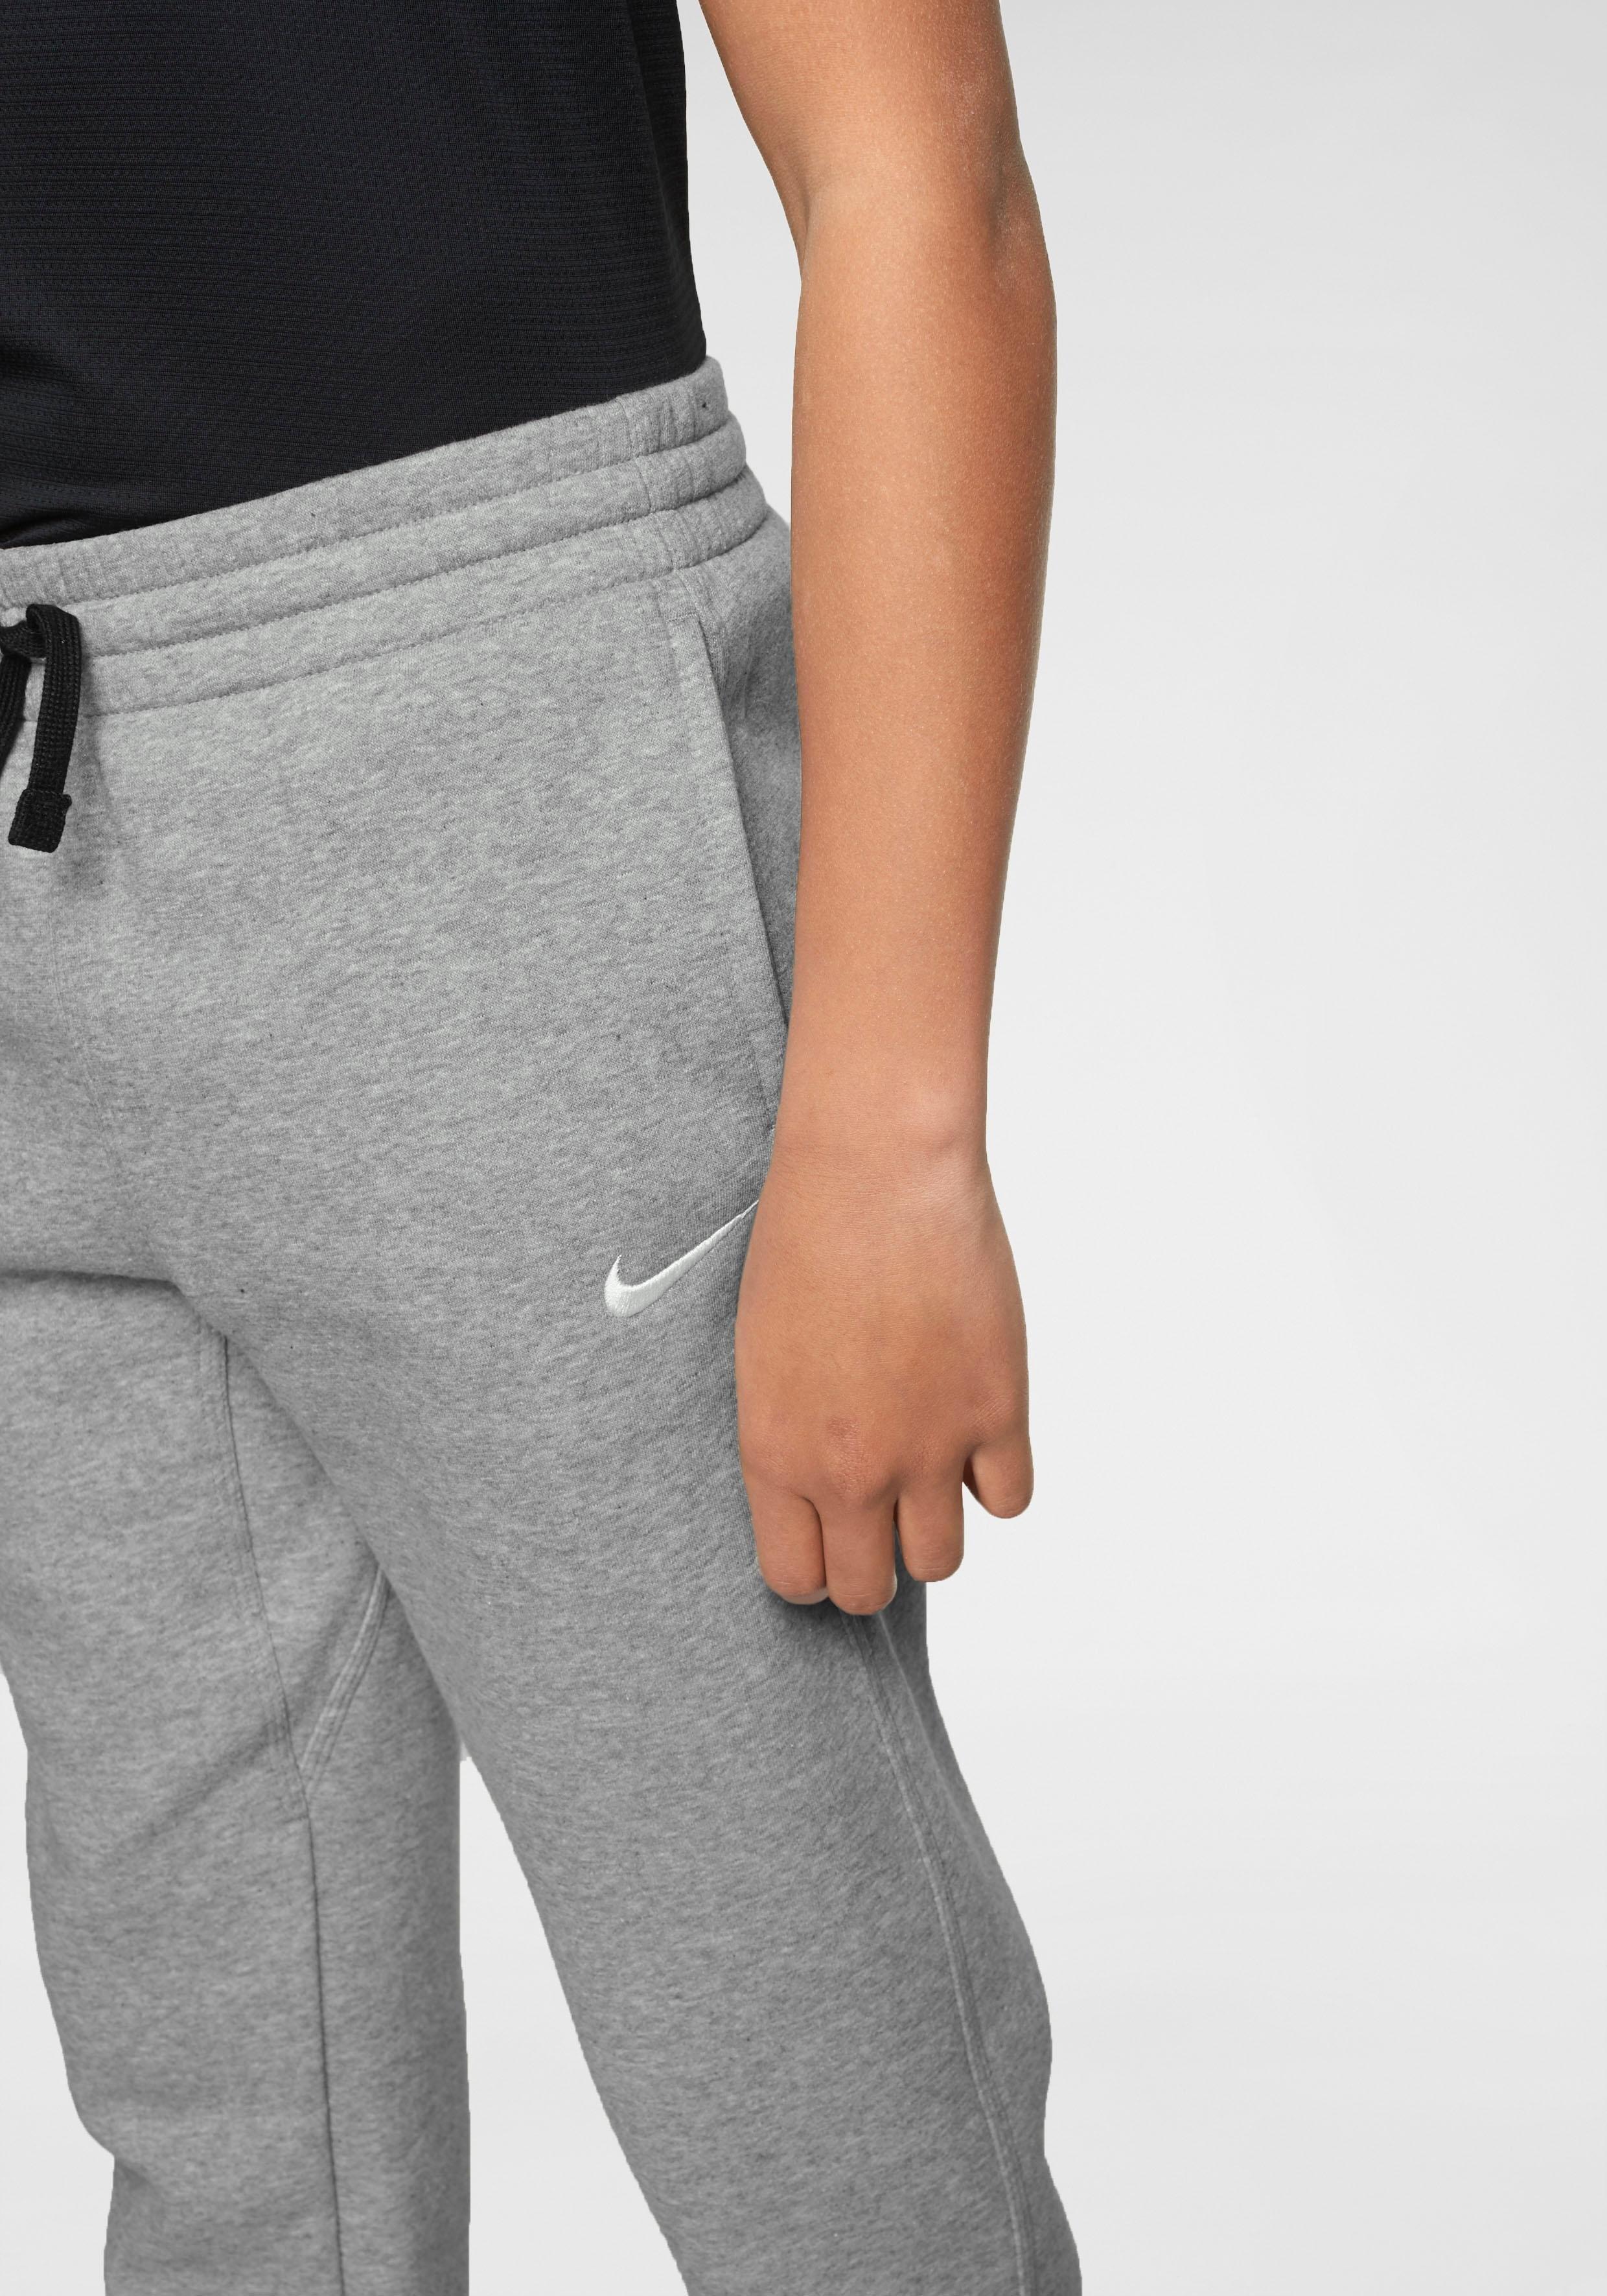 H En M Joggingbroek.Nike Sportswear Joggingbroek Boys Nike Pant N45 Core Brief Jogger